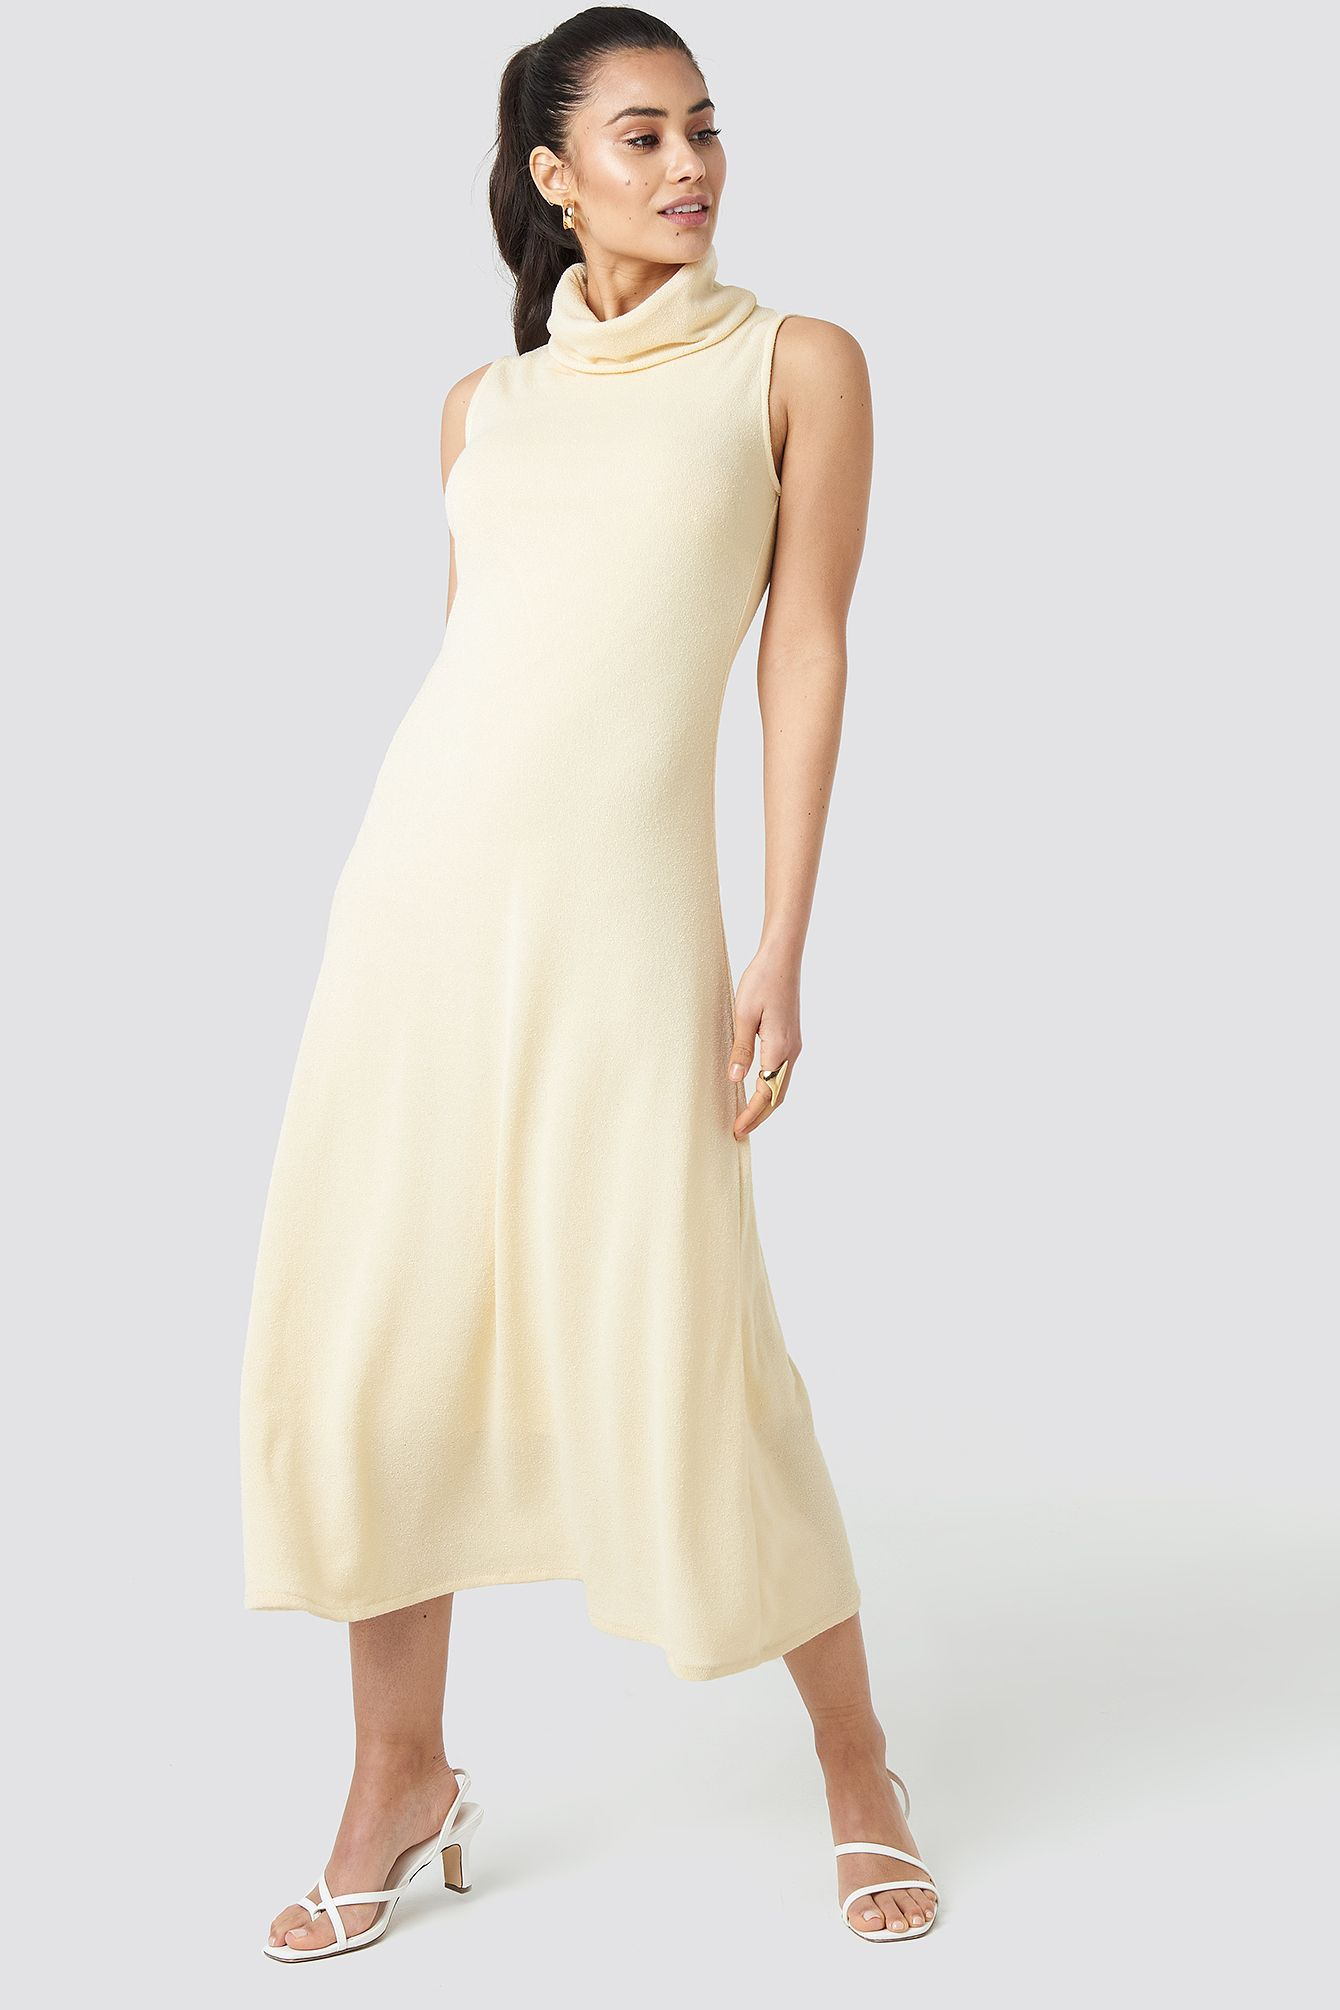 Mango Antony Dress White Dresses Maxi Dress White Dress [ 2010 x 1340 Pixel ]